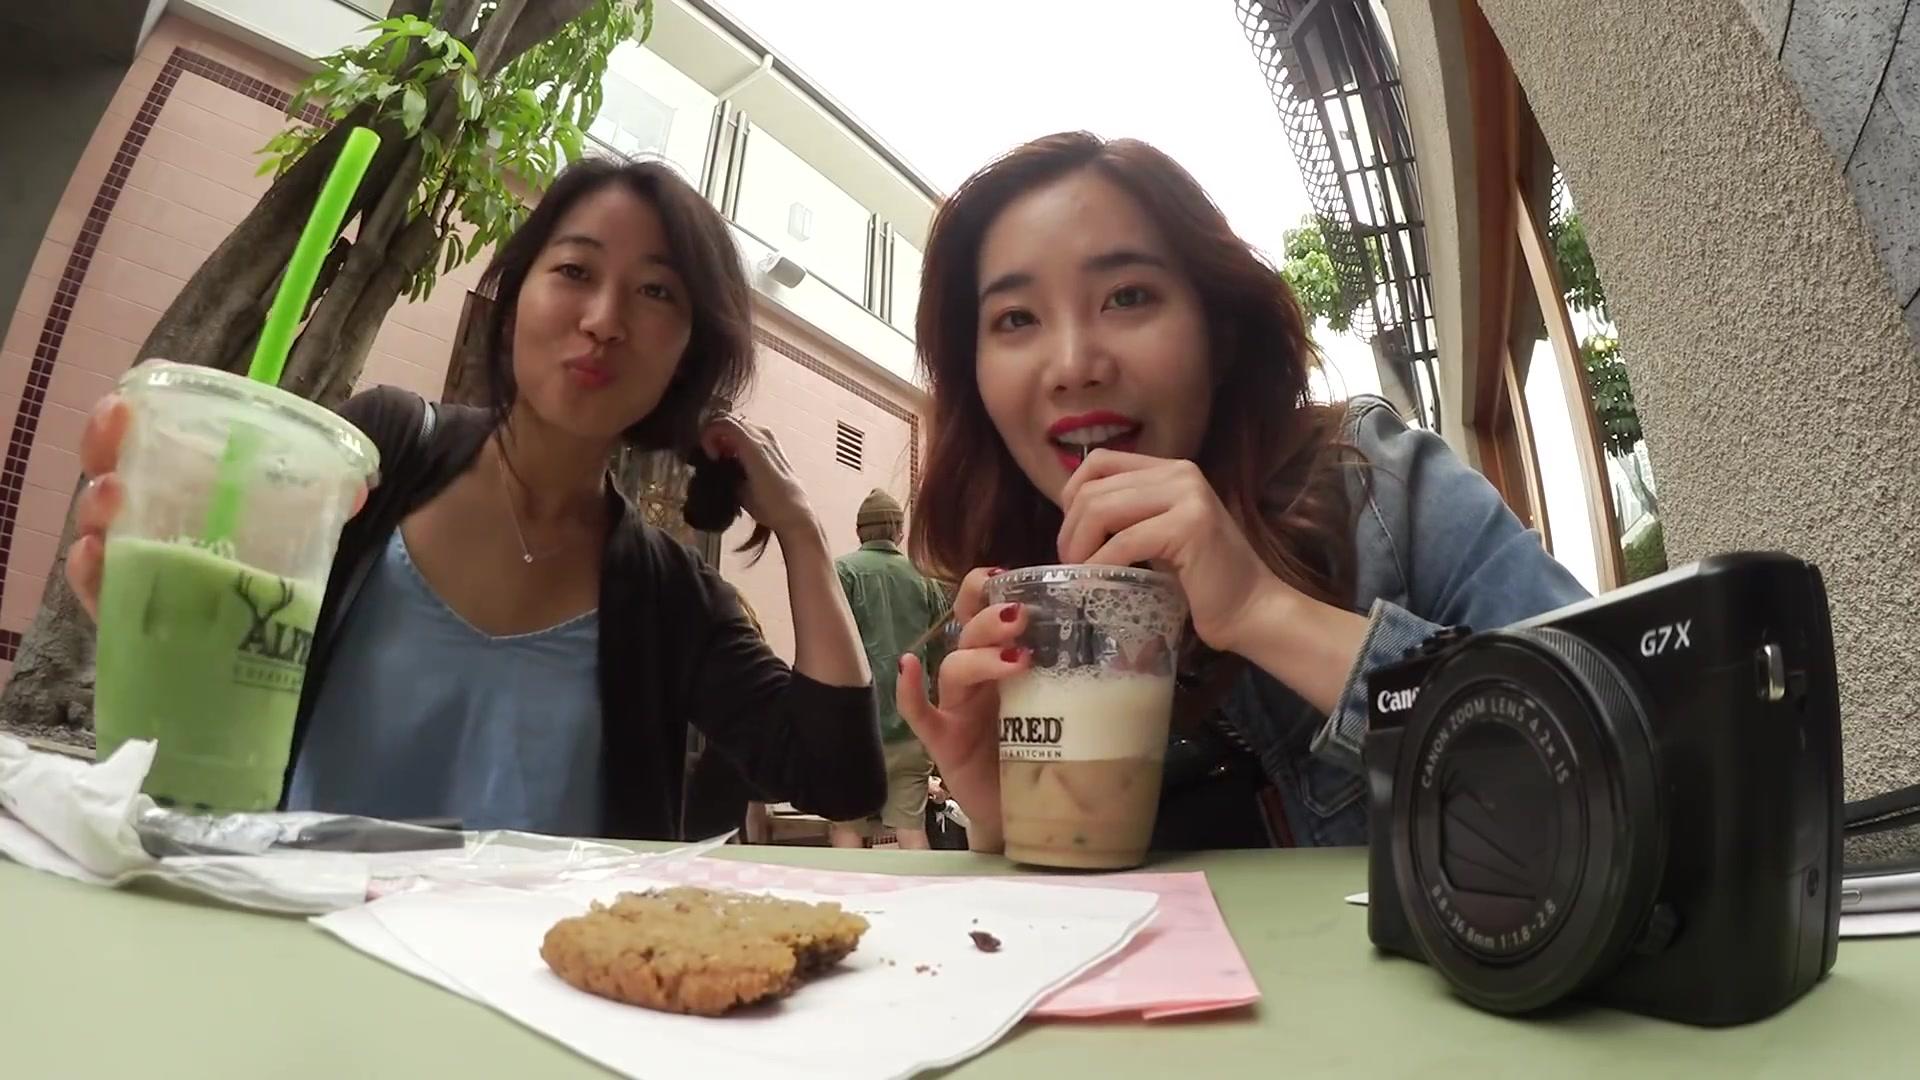 Joanday Episode 20: Running Errands in LA: T-Mobile, Target & Trader Joe's